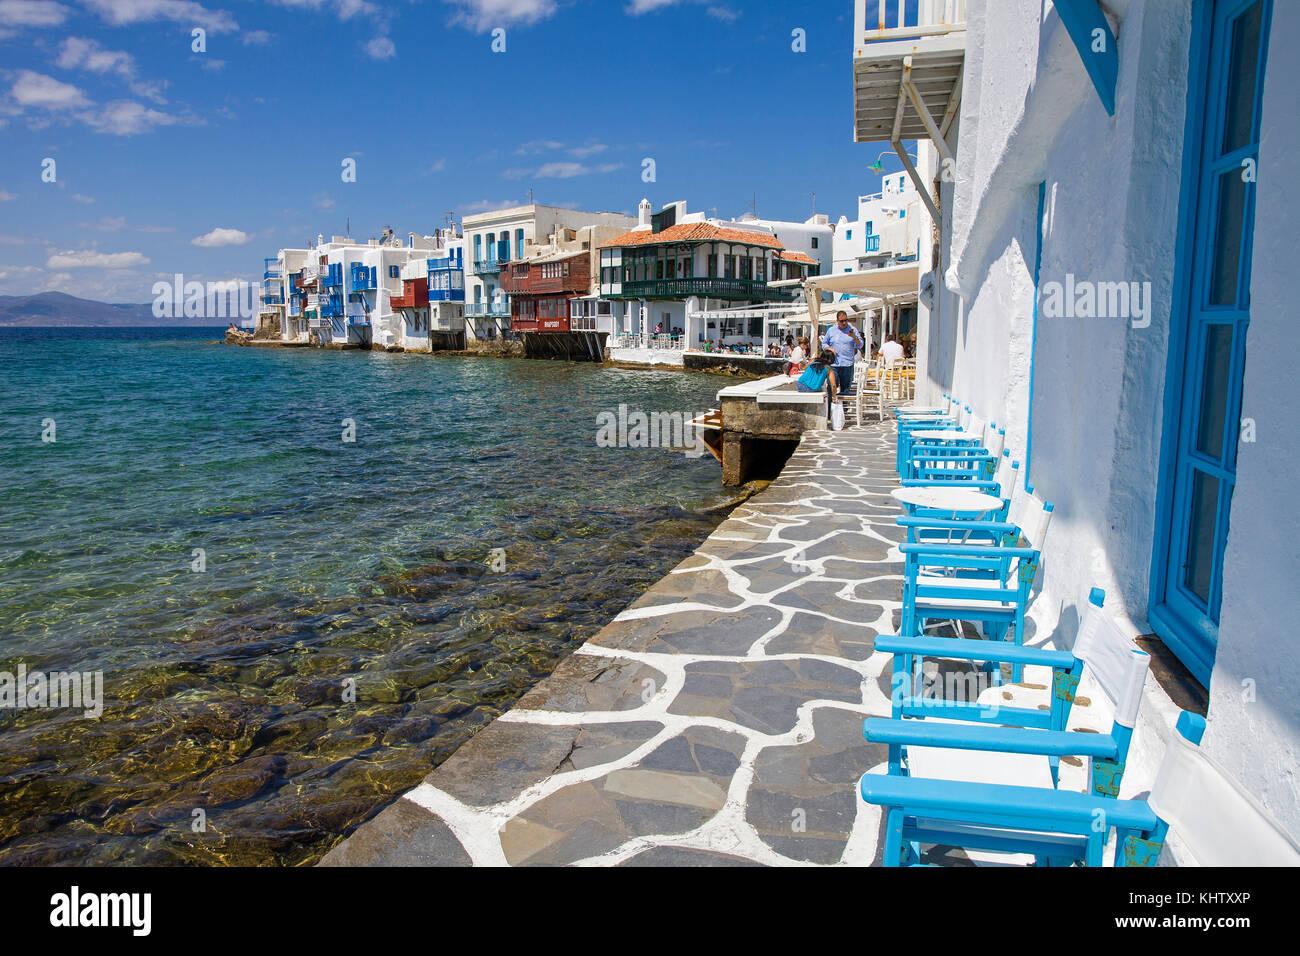 Klein Venedig in Mykonos-Stadt, klein Venedig im Mykonos-Stadt, Mykonos, Kykladen, Ägäis, Griechenland, Stockbild